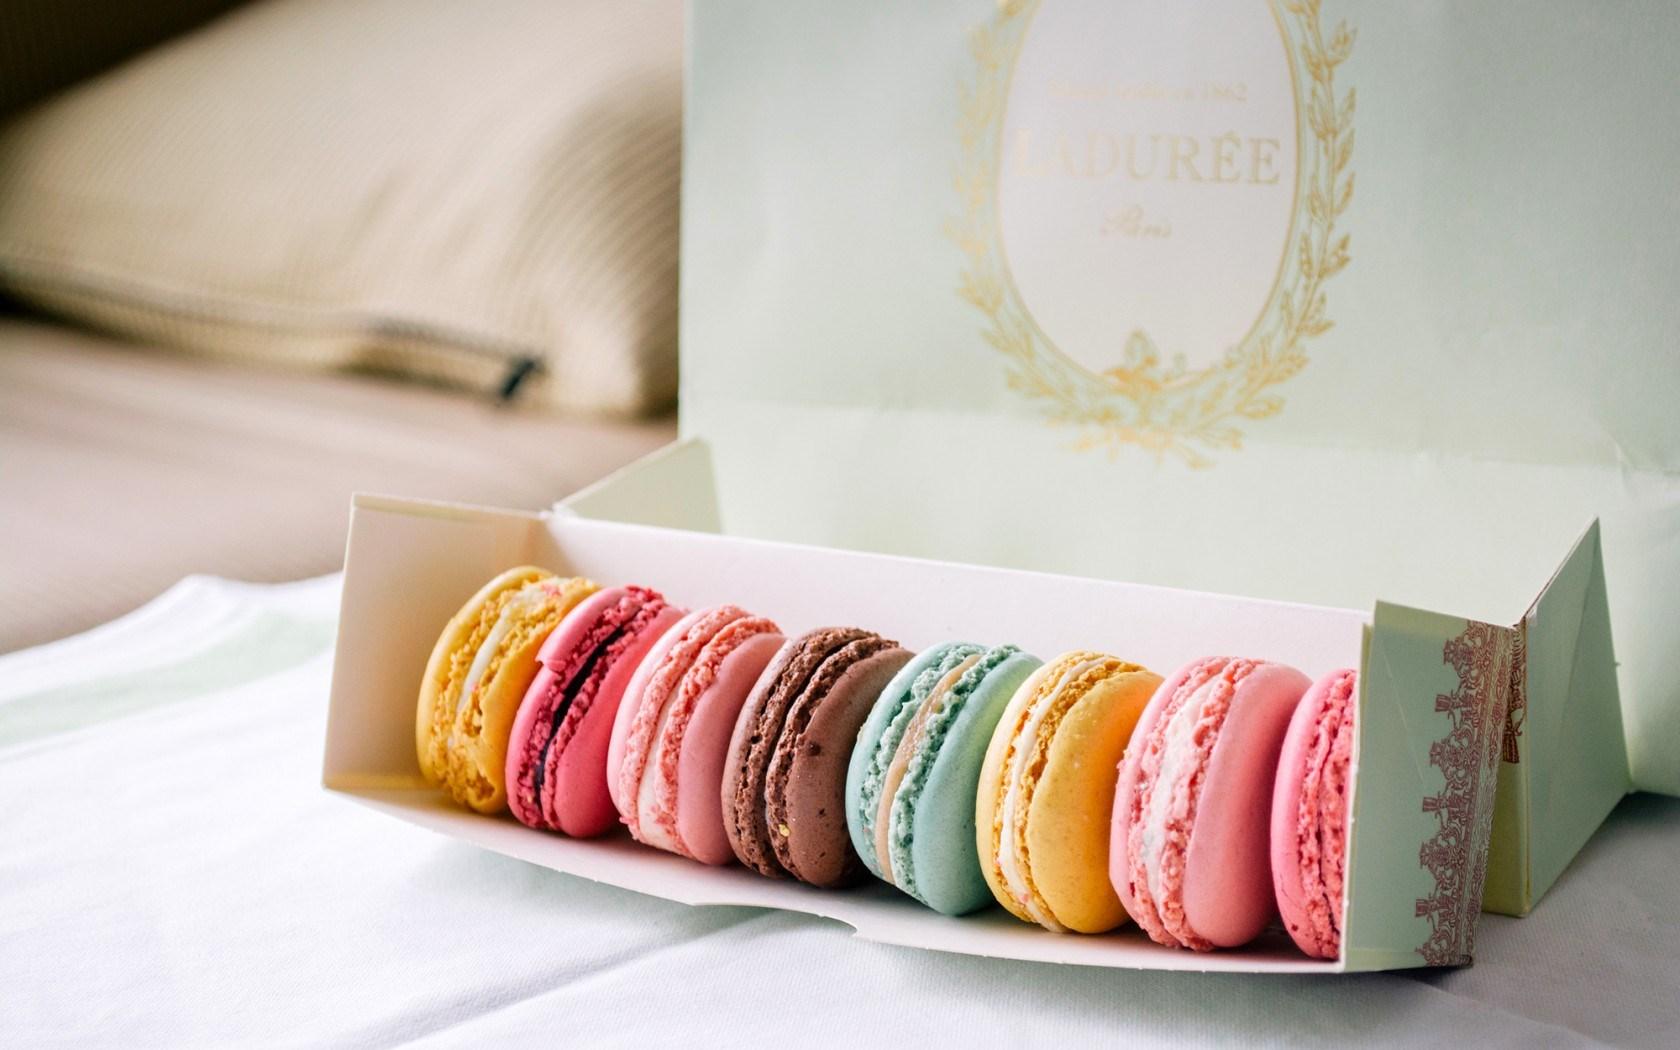 Cookies Macaron Colorful Dessert Box Wallpaper 1680x1050 24139